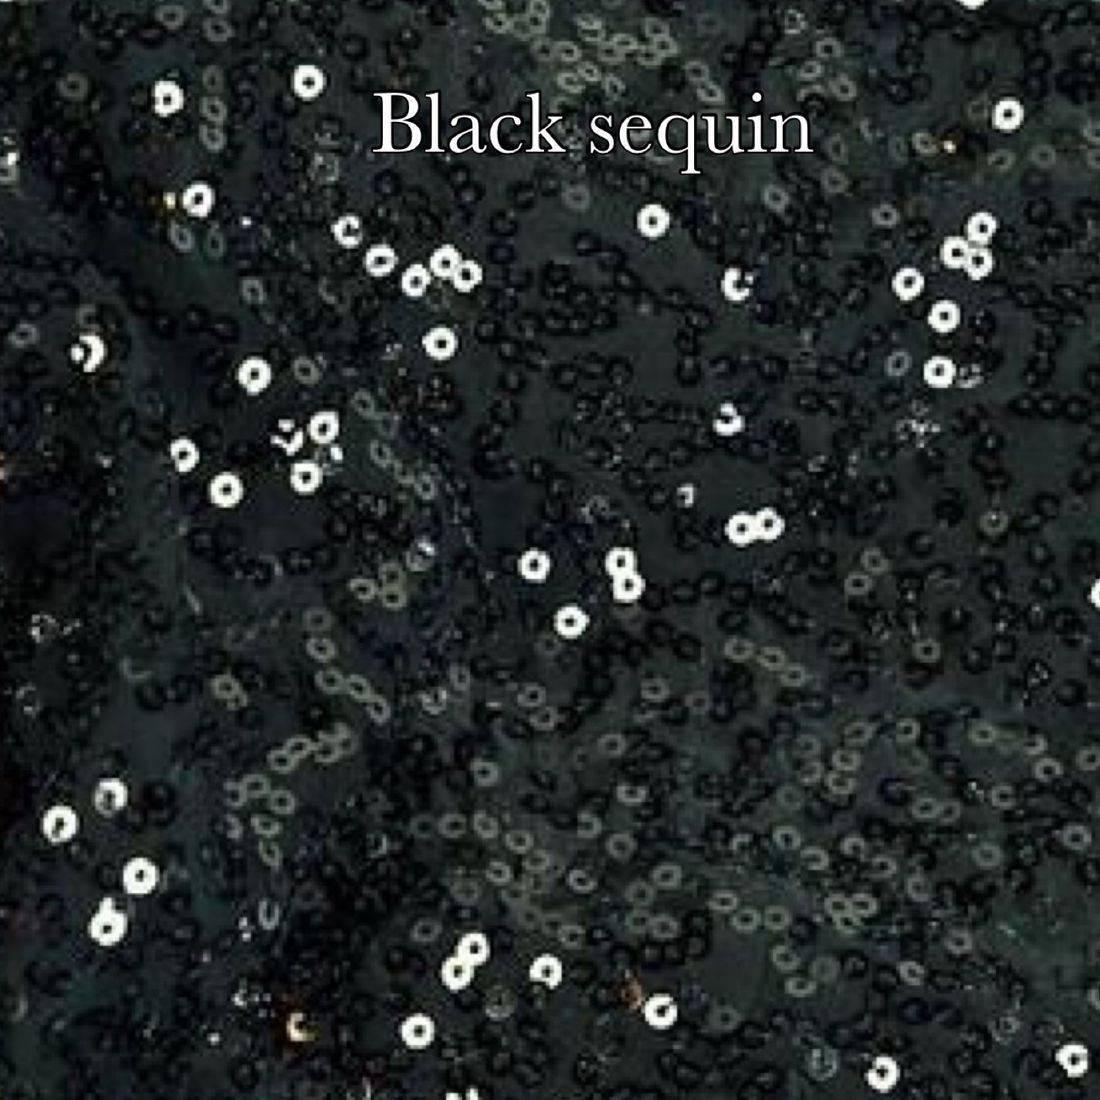 Black sequin